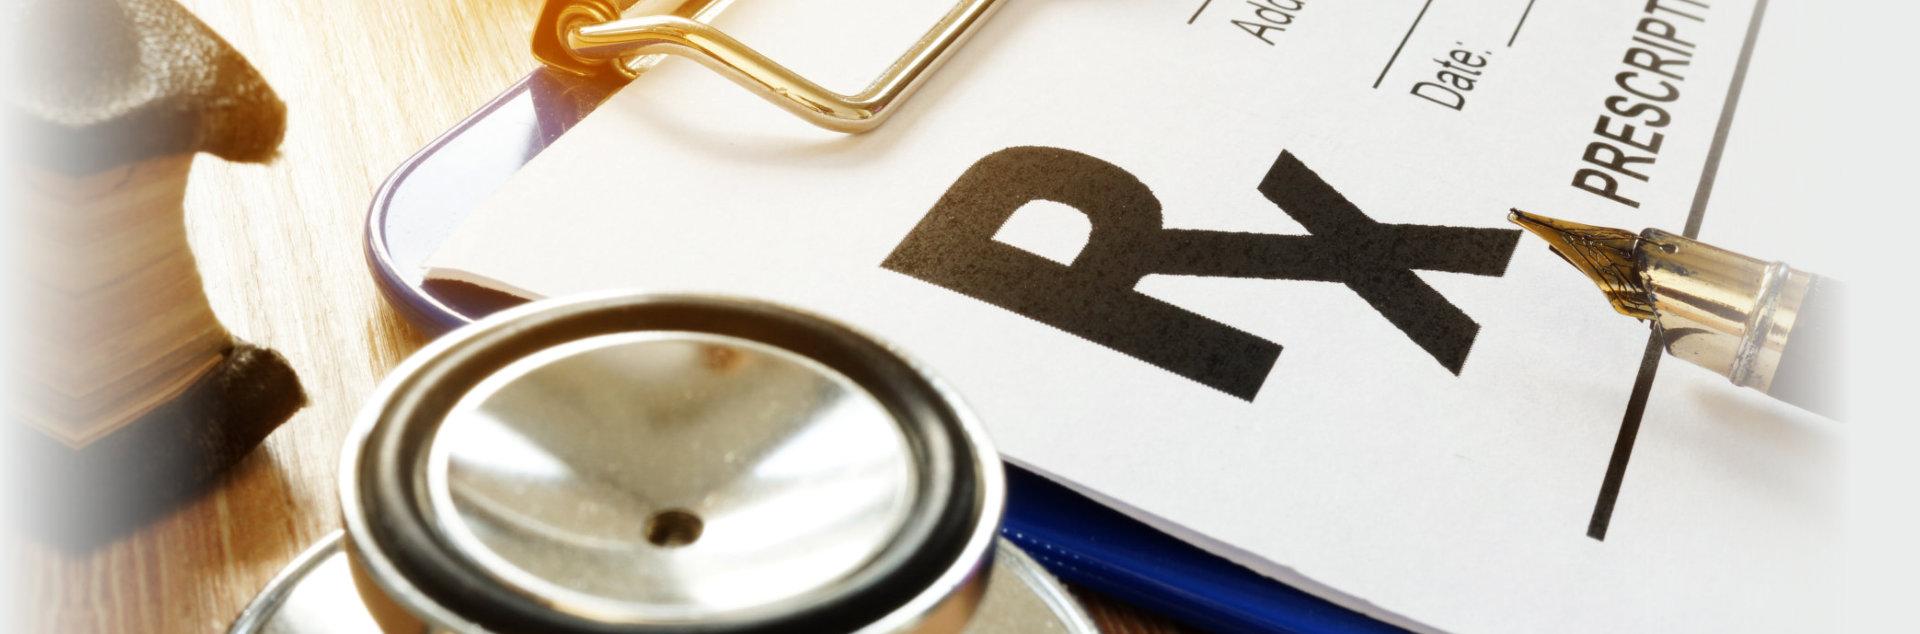 Health care concept. Prescription form for medicines.